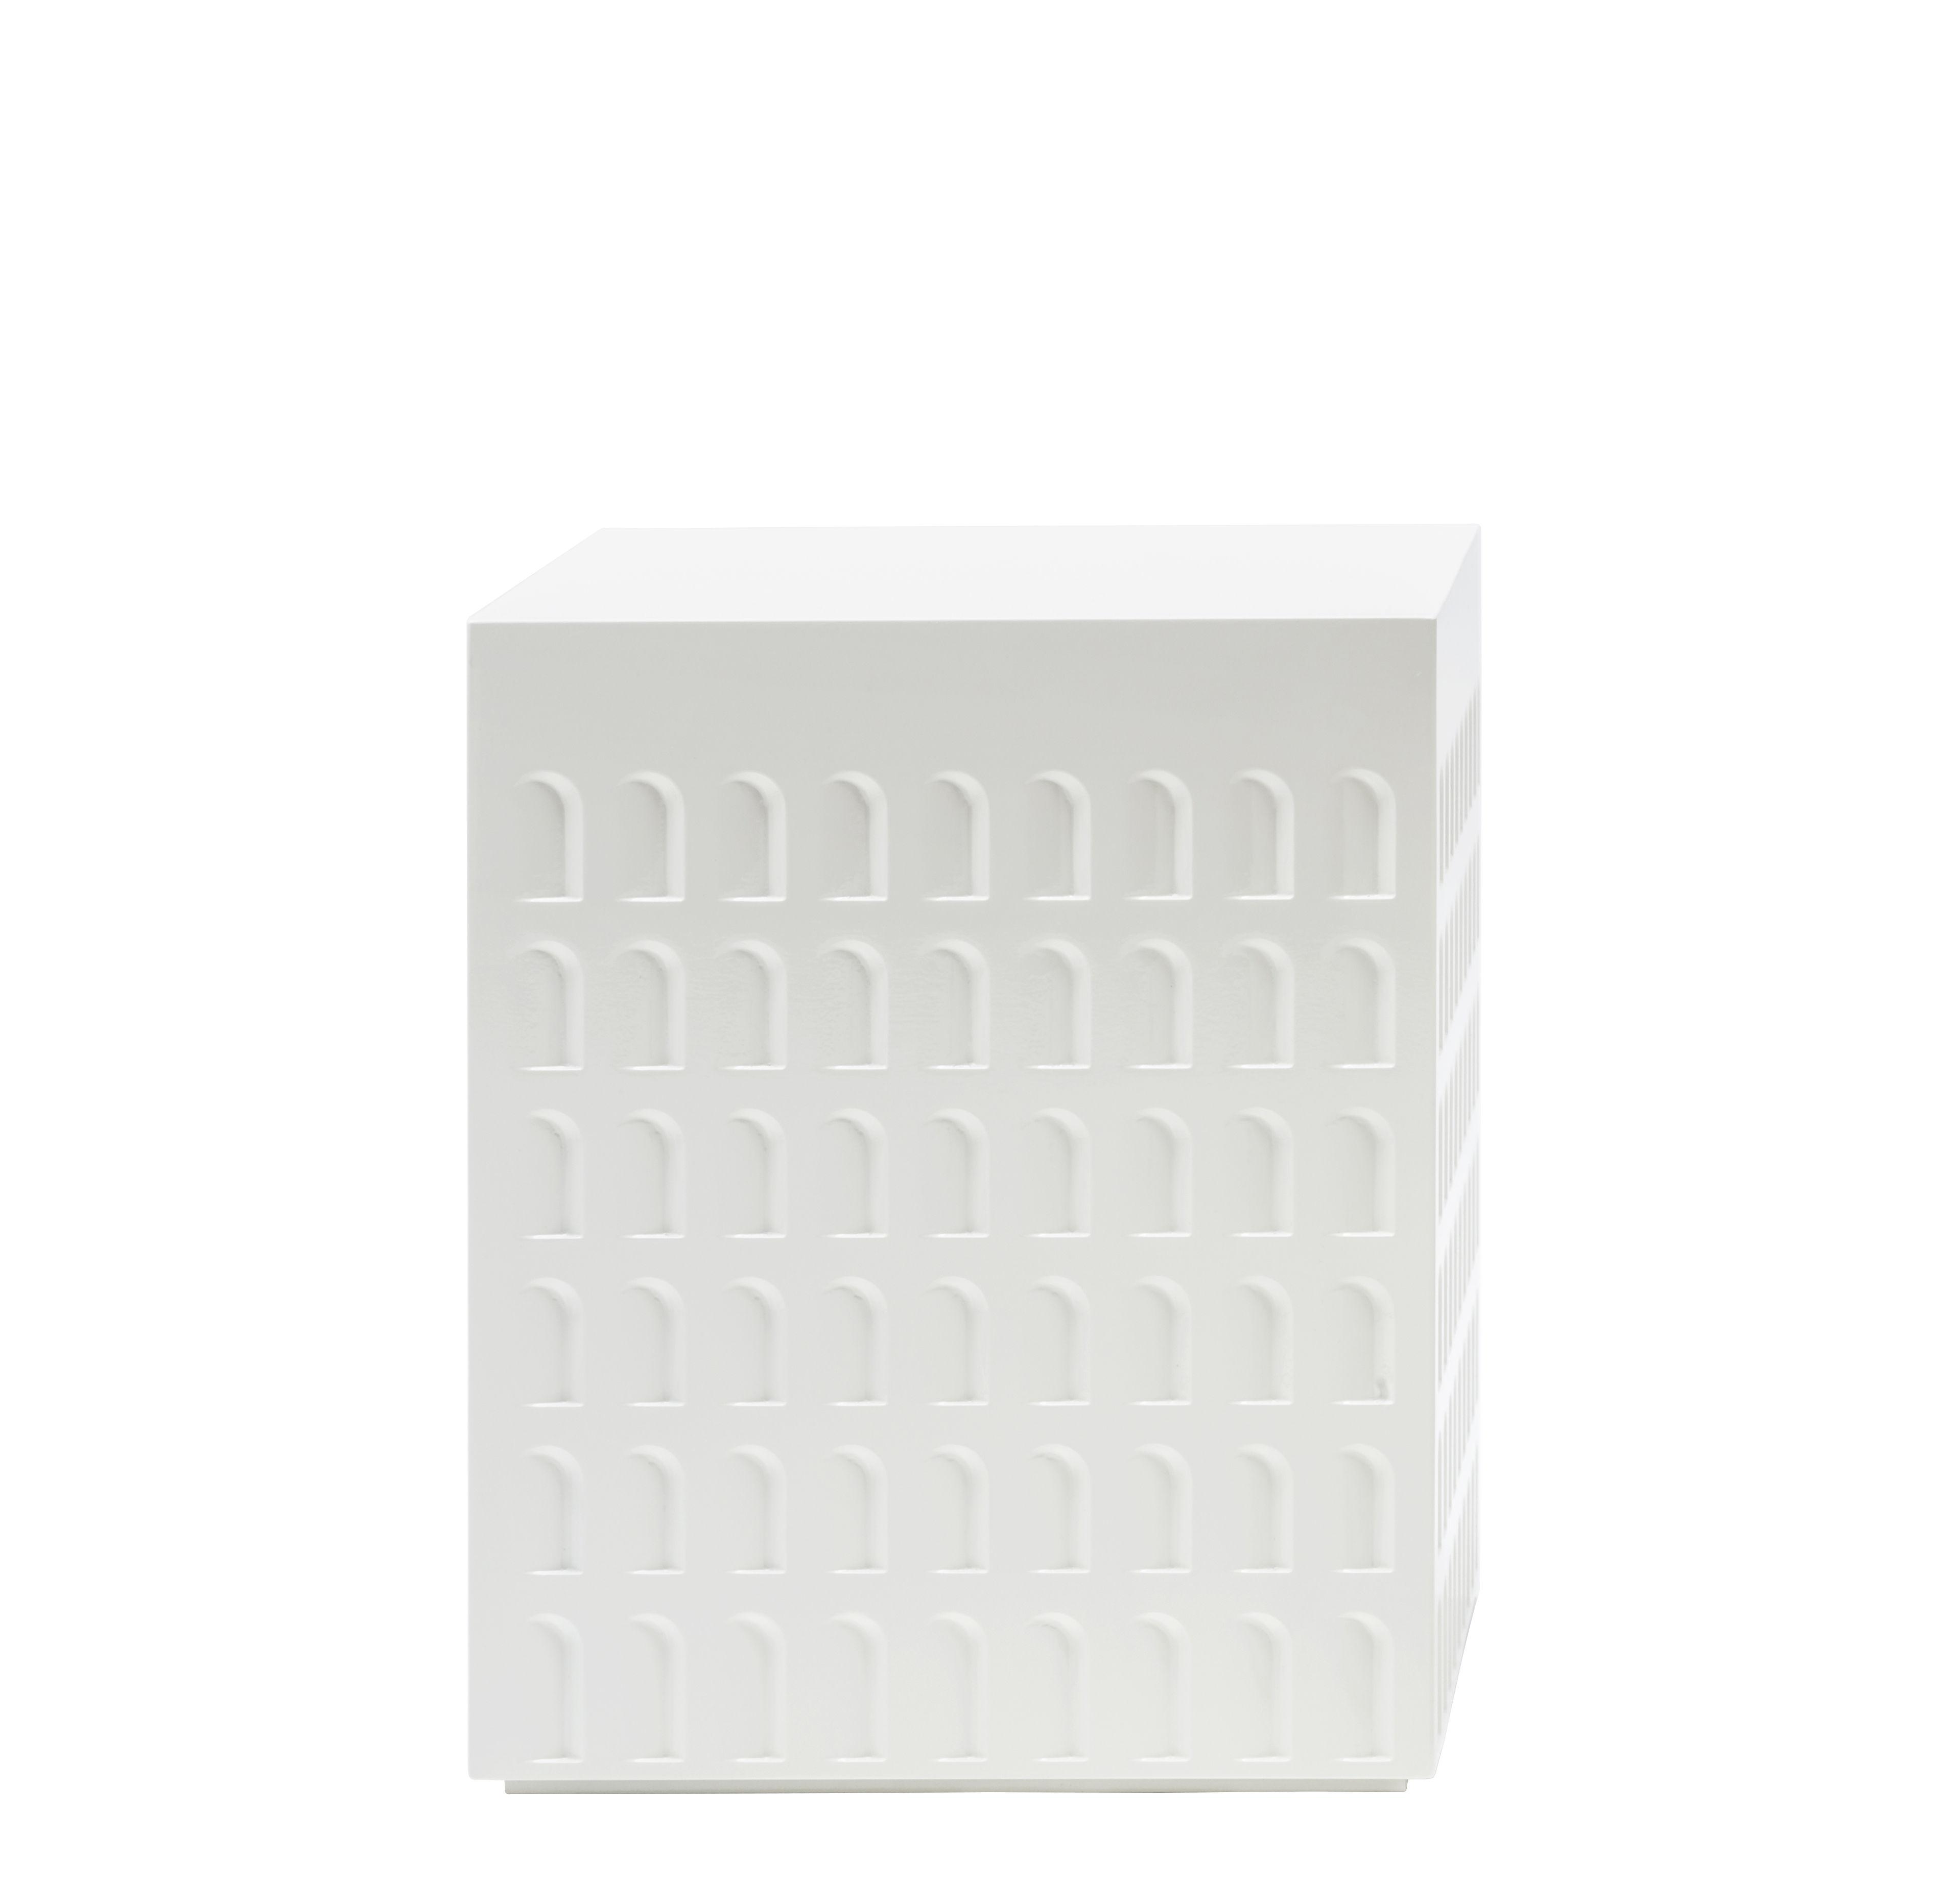 Arredamento - Tavolini  - Sgabello Eur - / Tavolino di Kartell - Bianco - Tecnopolimero termoplastico